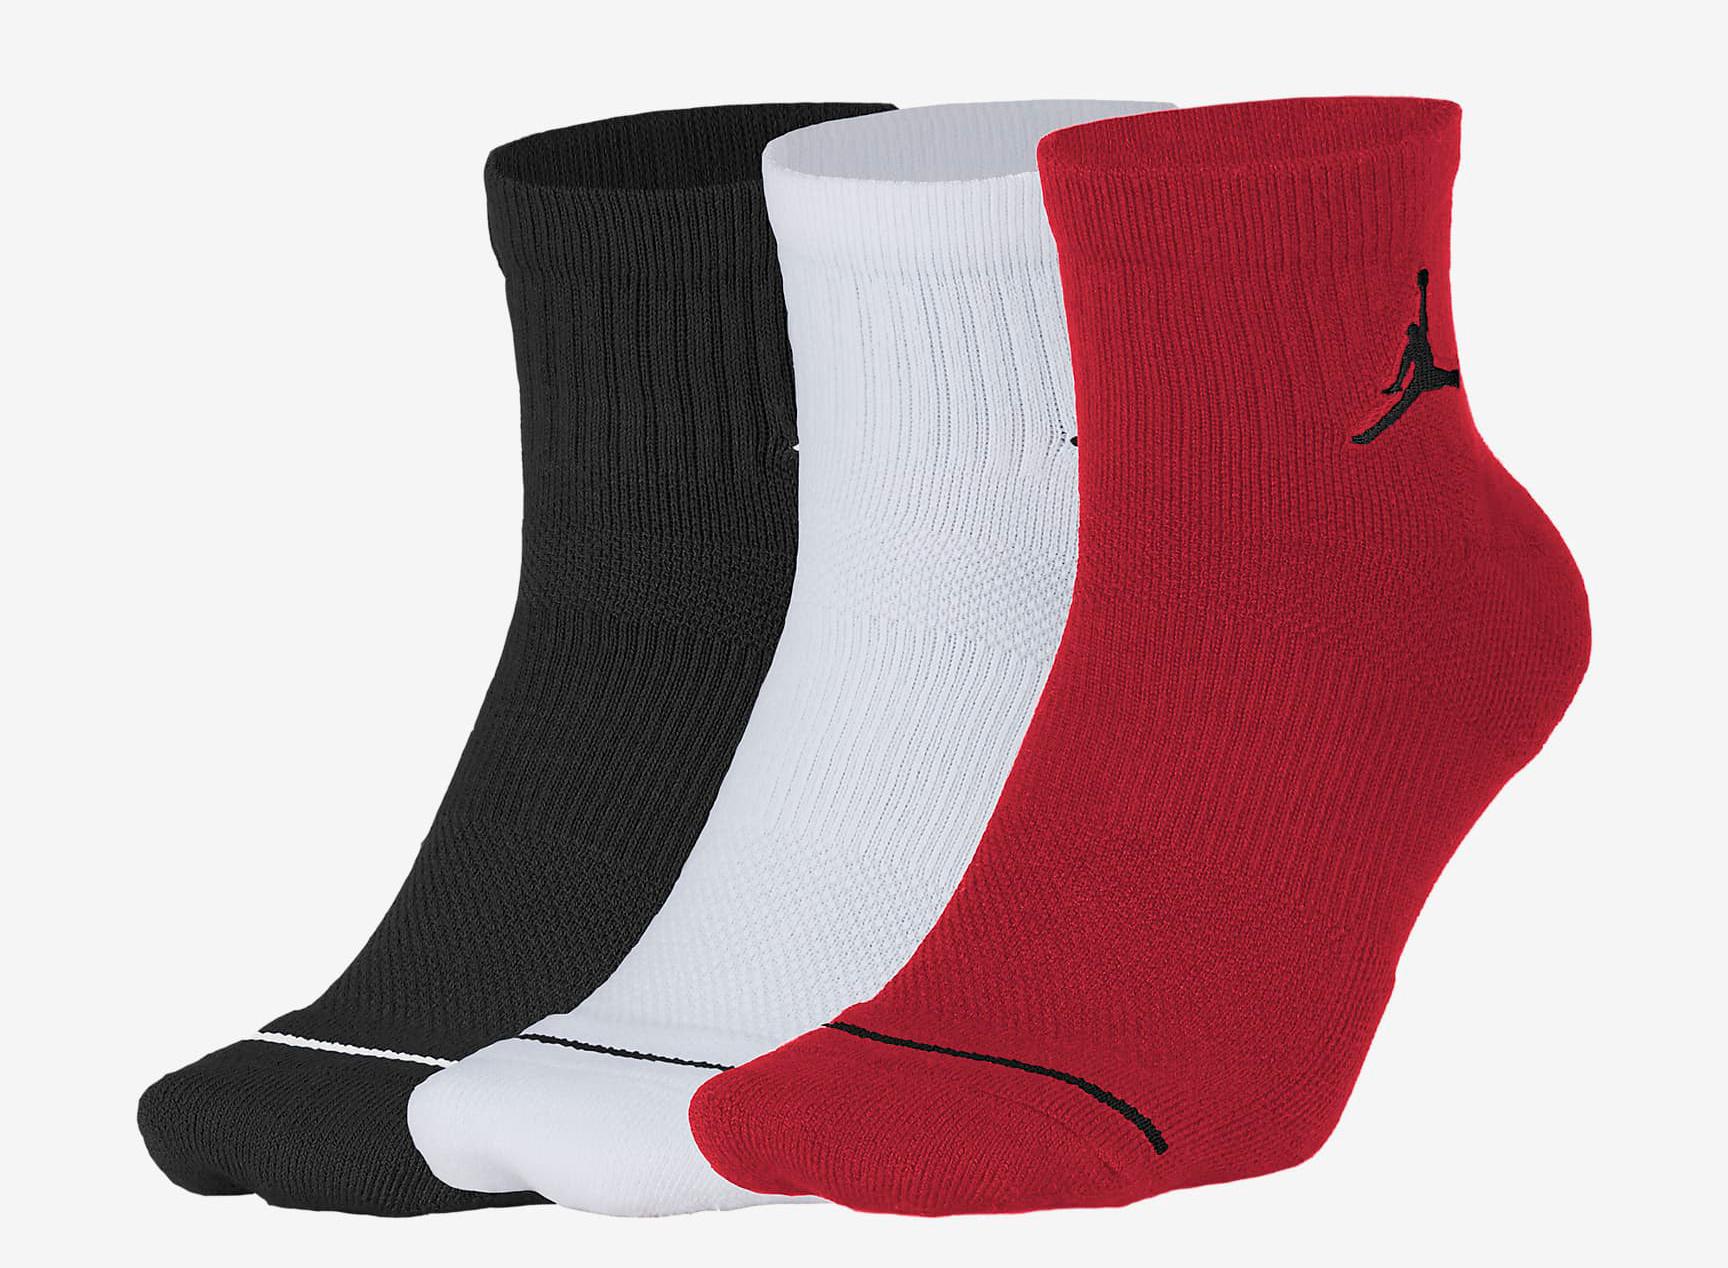 jordan-jumpman-everyday-max-ankle-socks-red-black-white